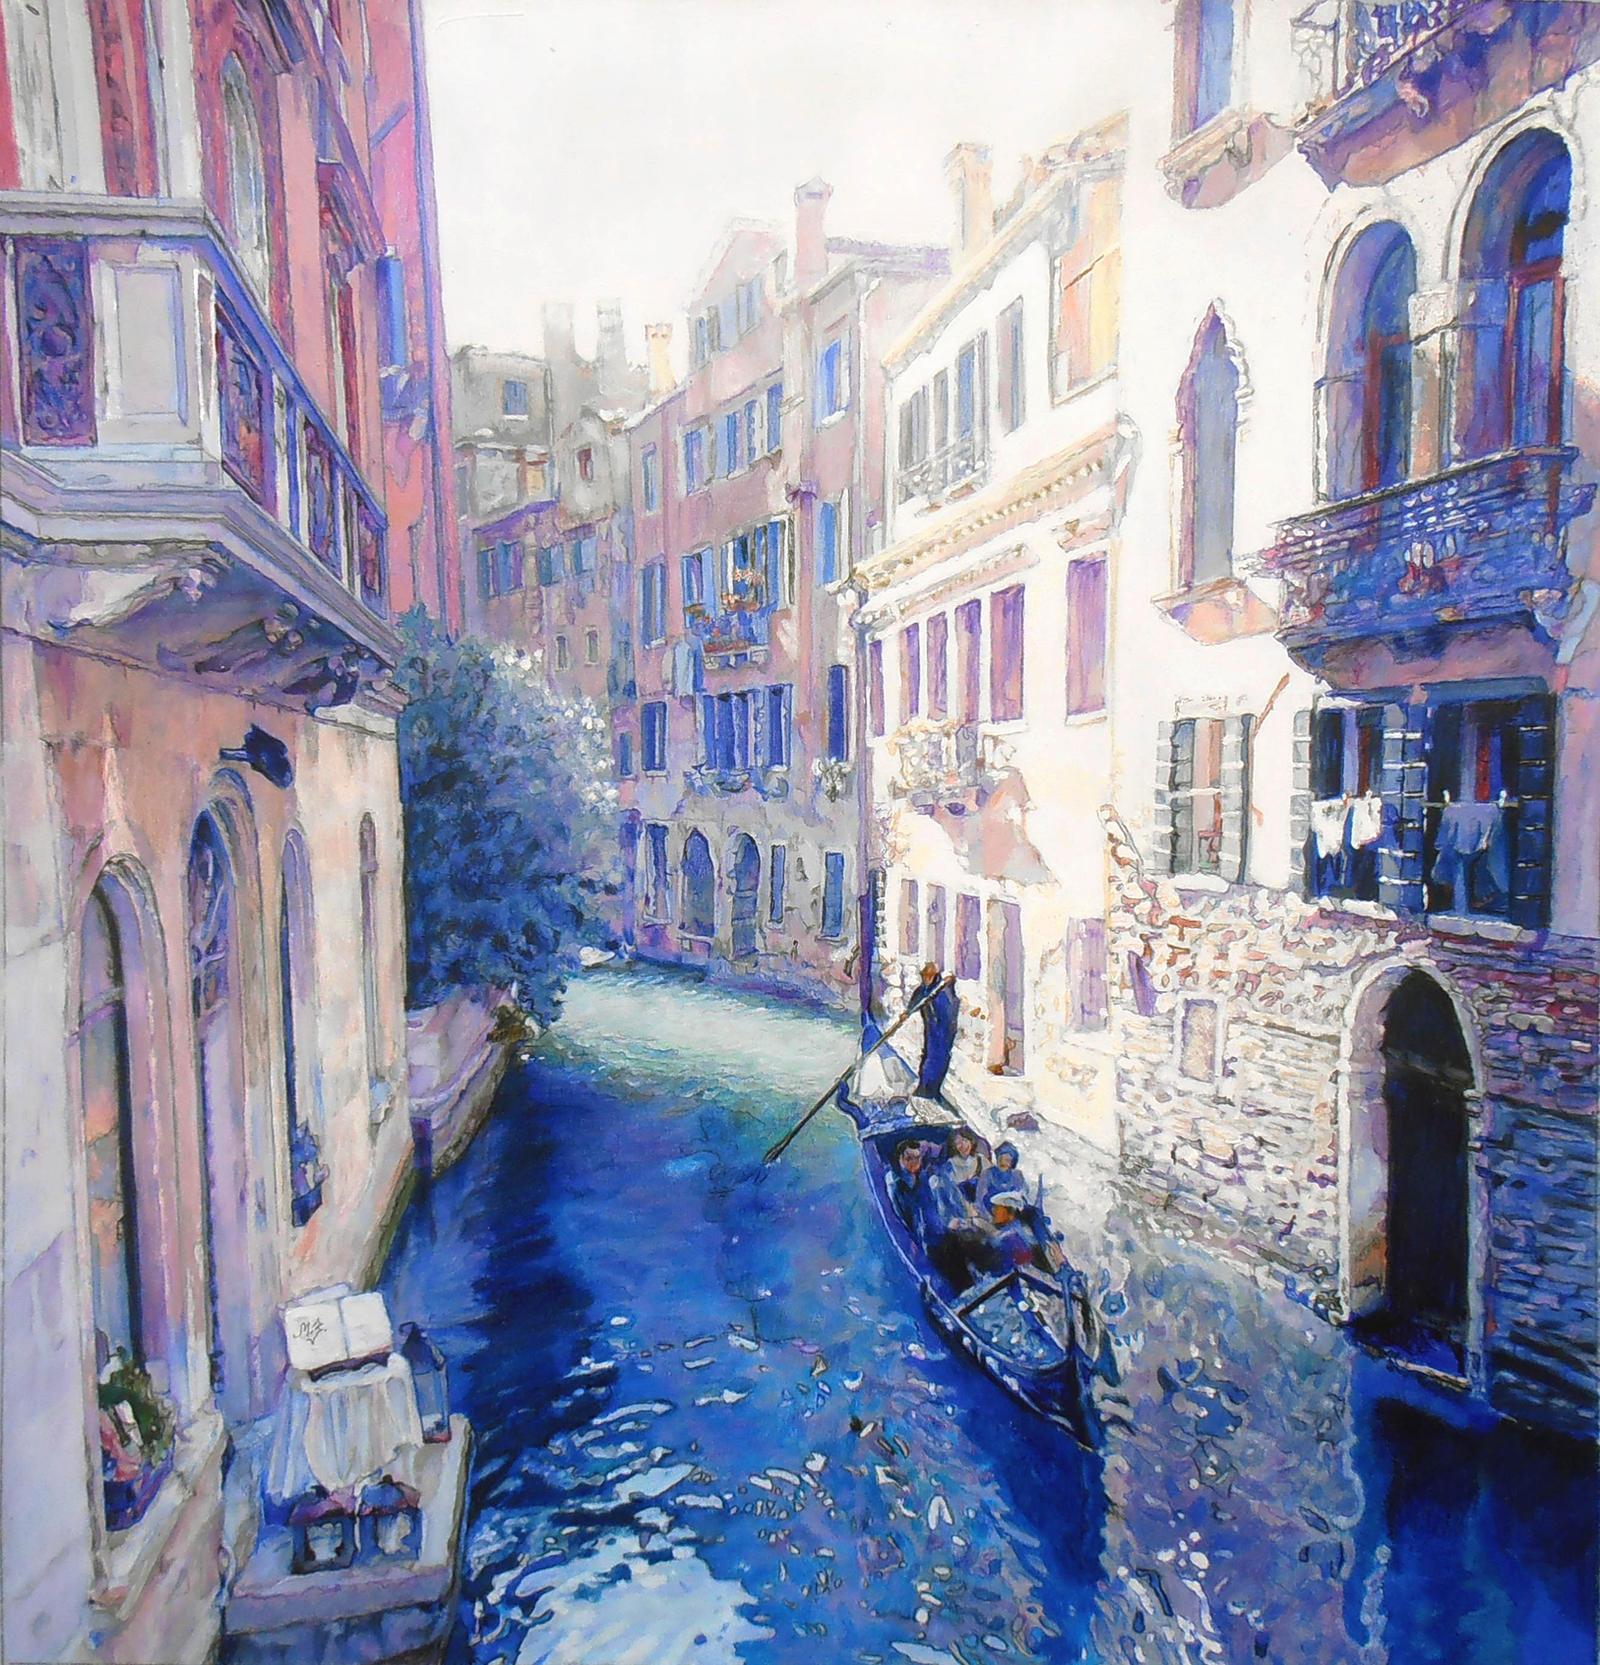 A la watercolor by zeldis